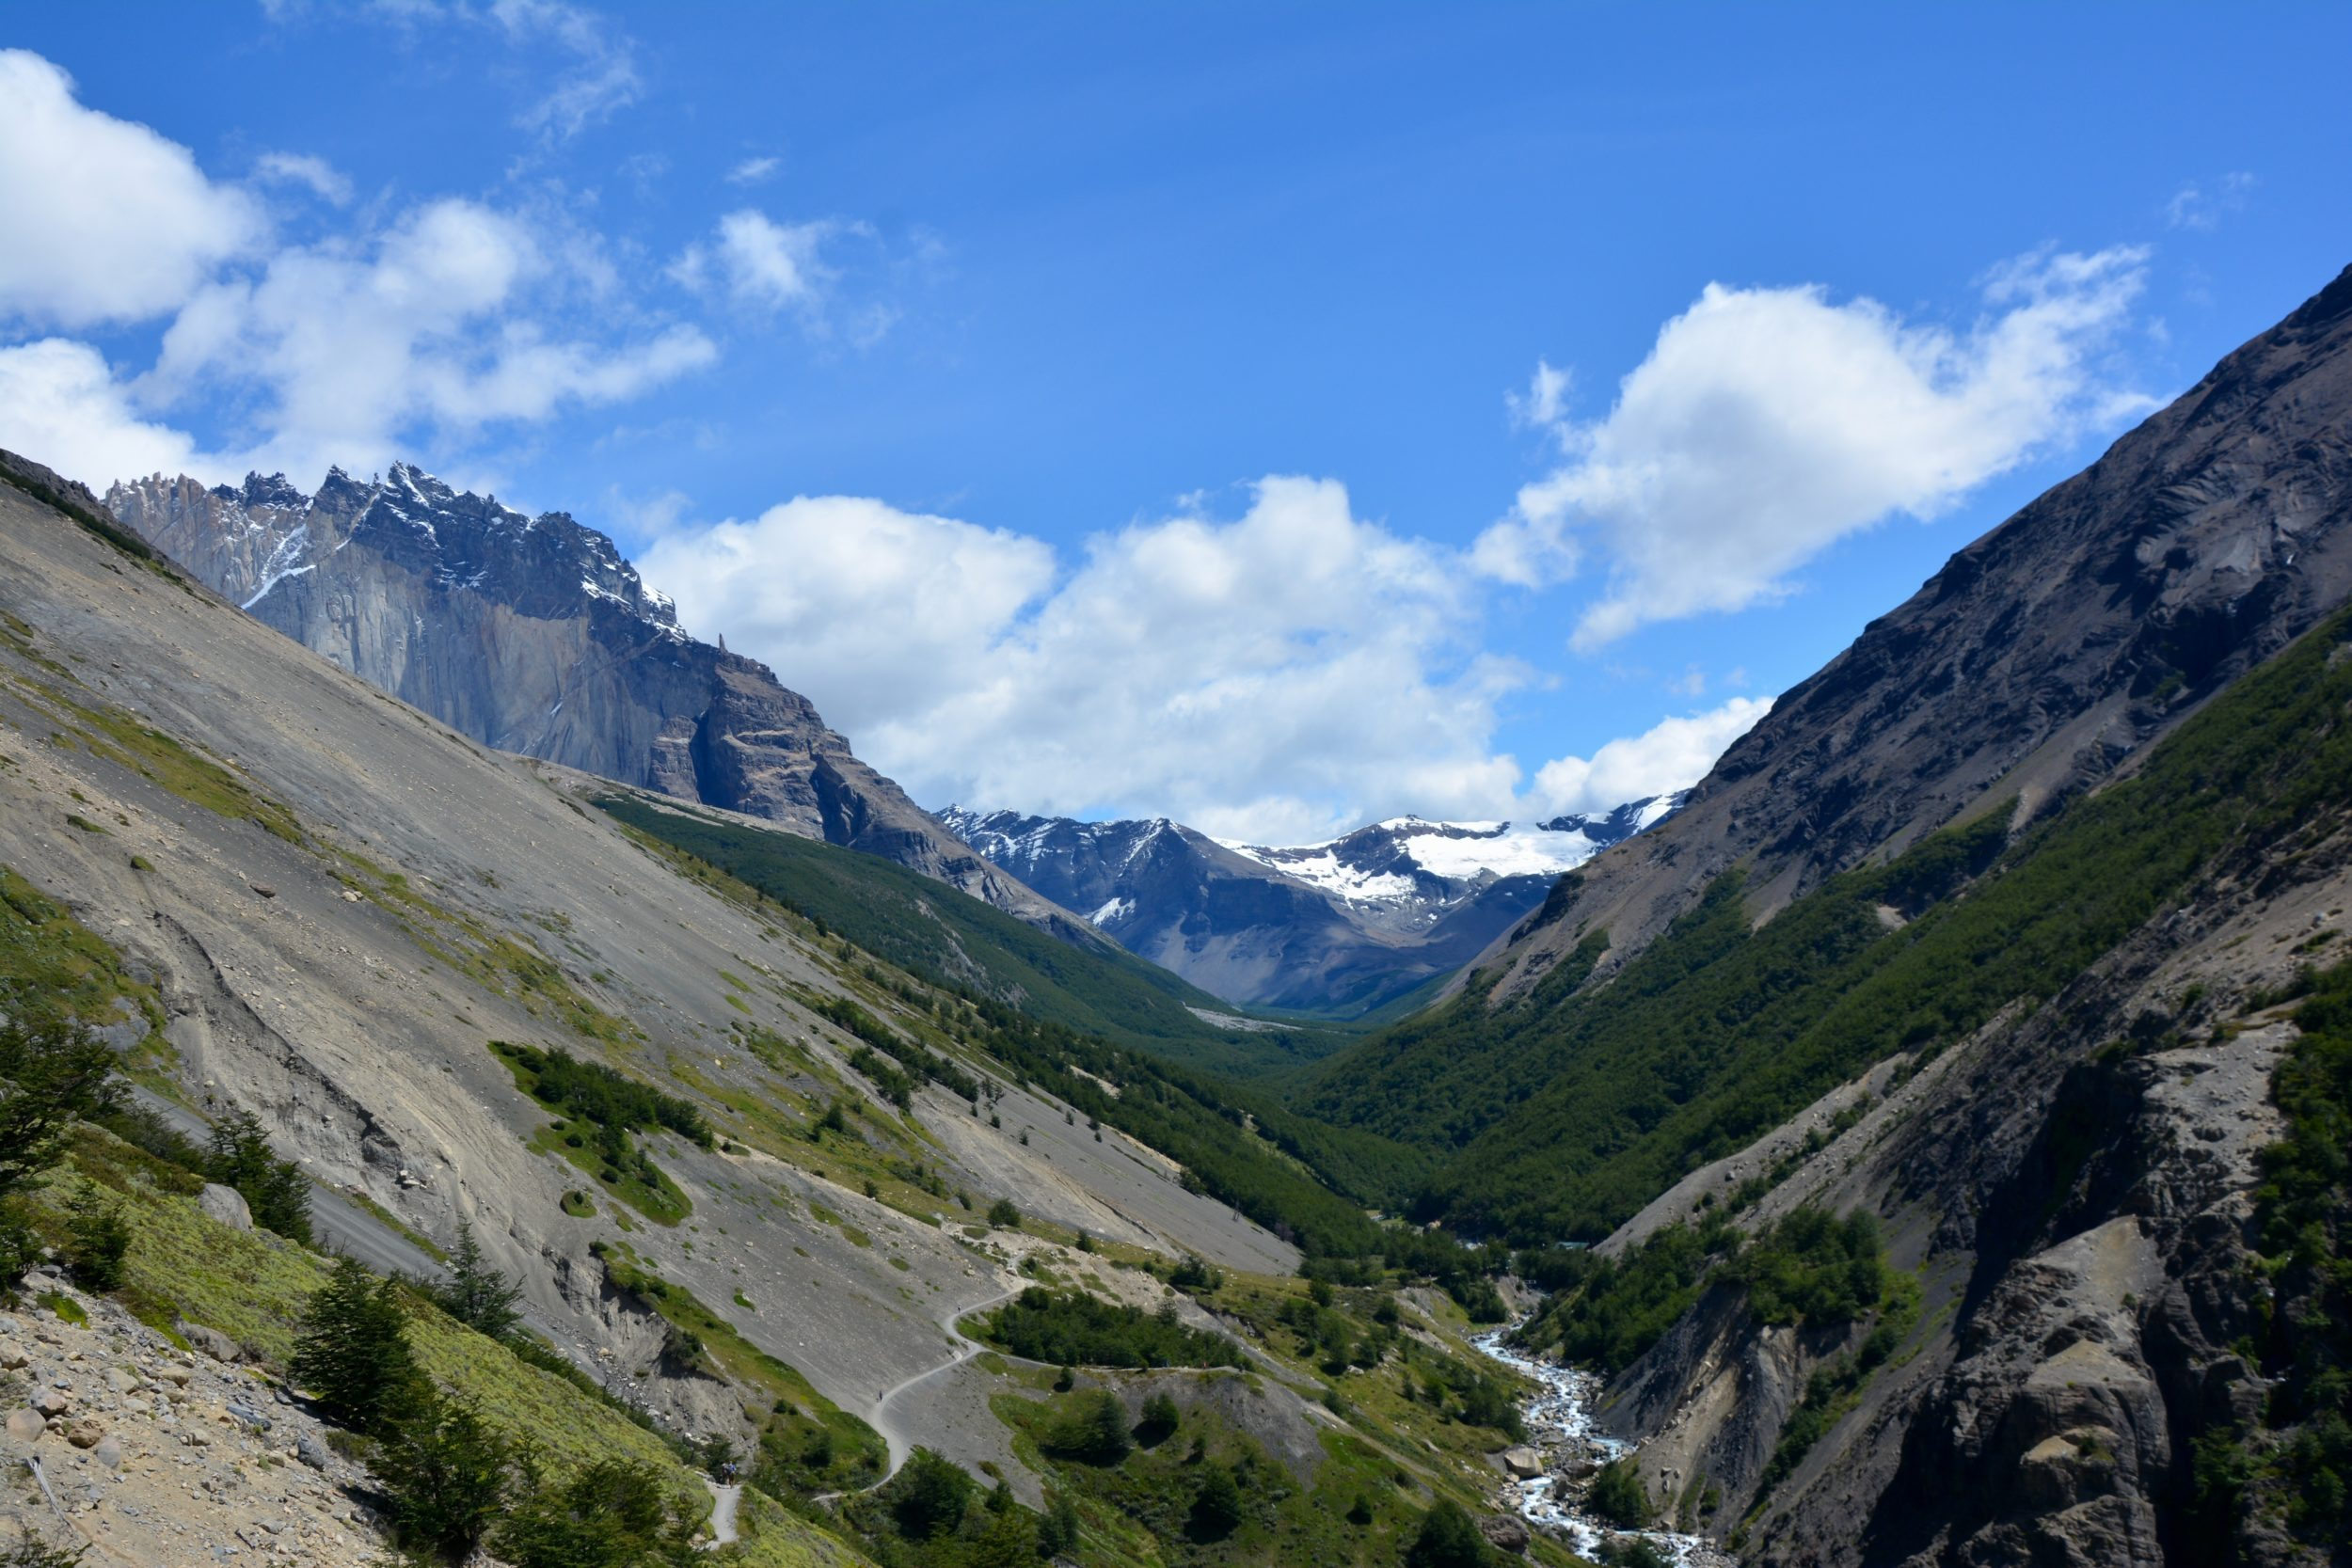 Campement Chileno, Valle Ascensio, Torres del paine